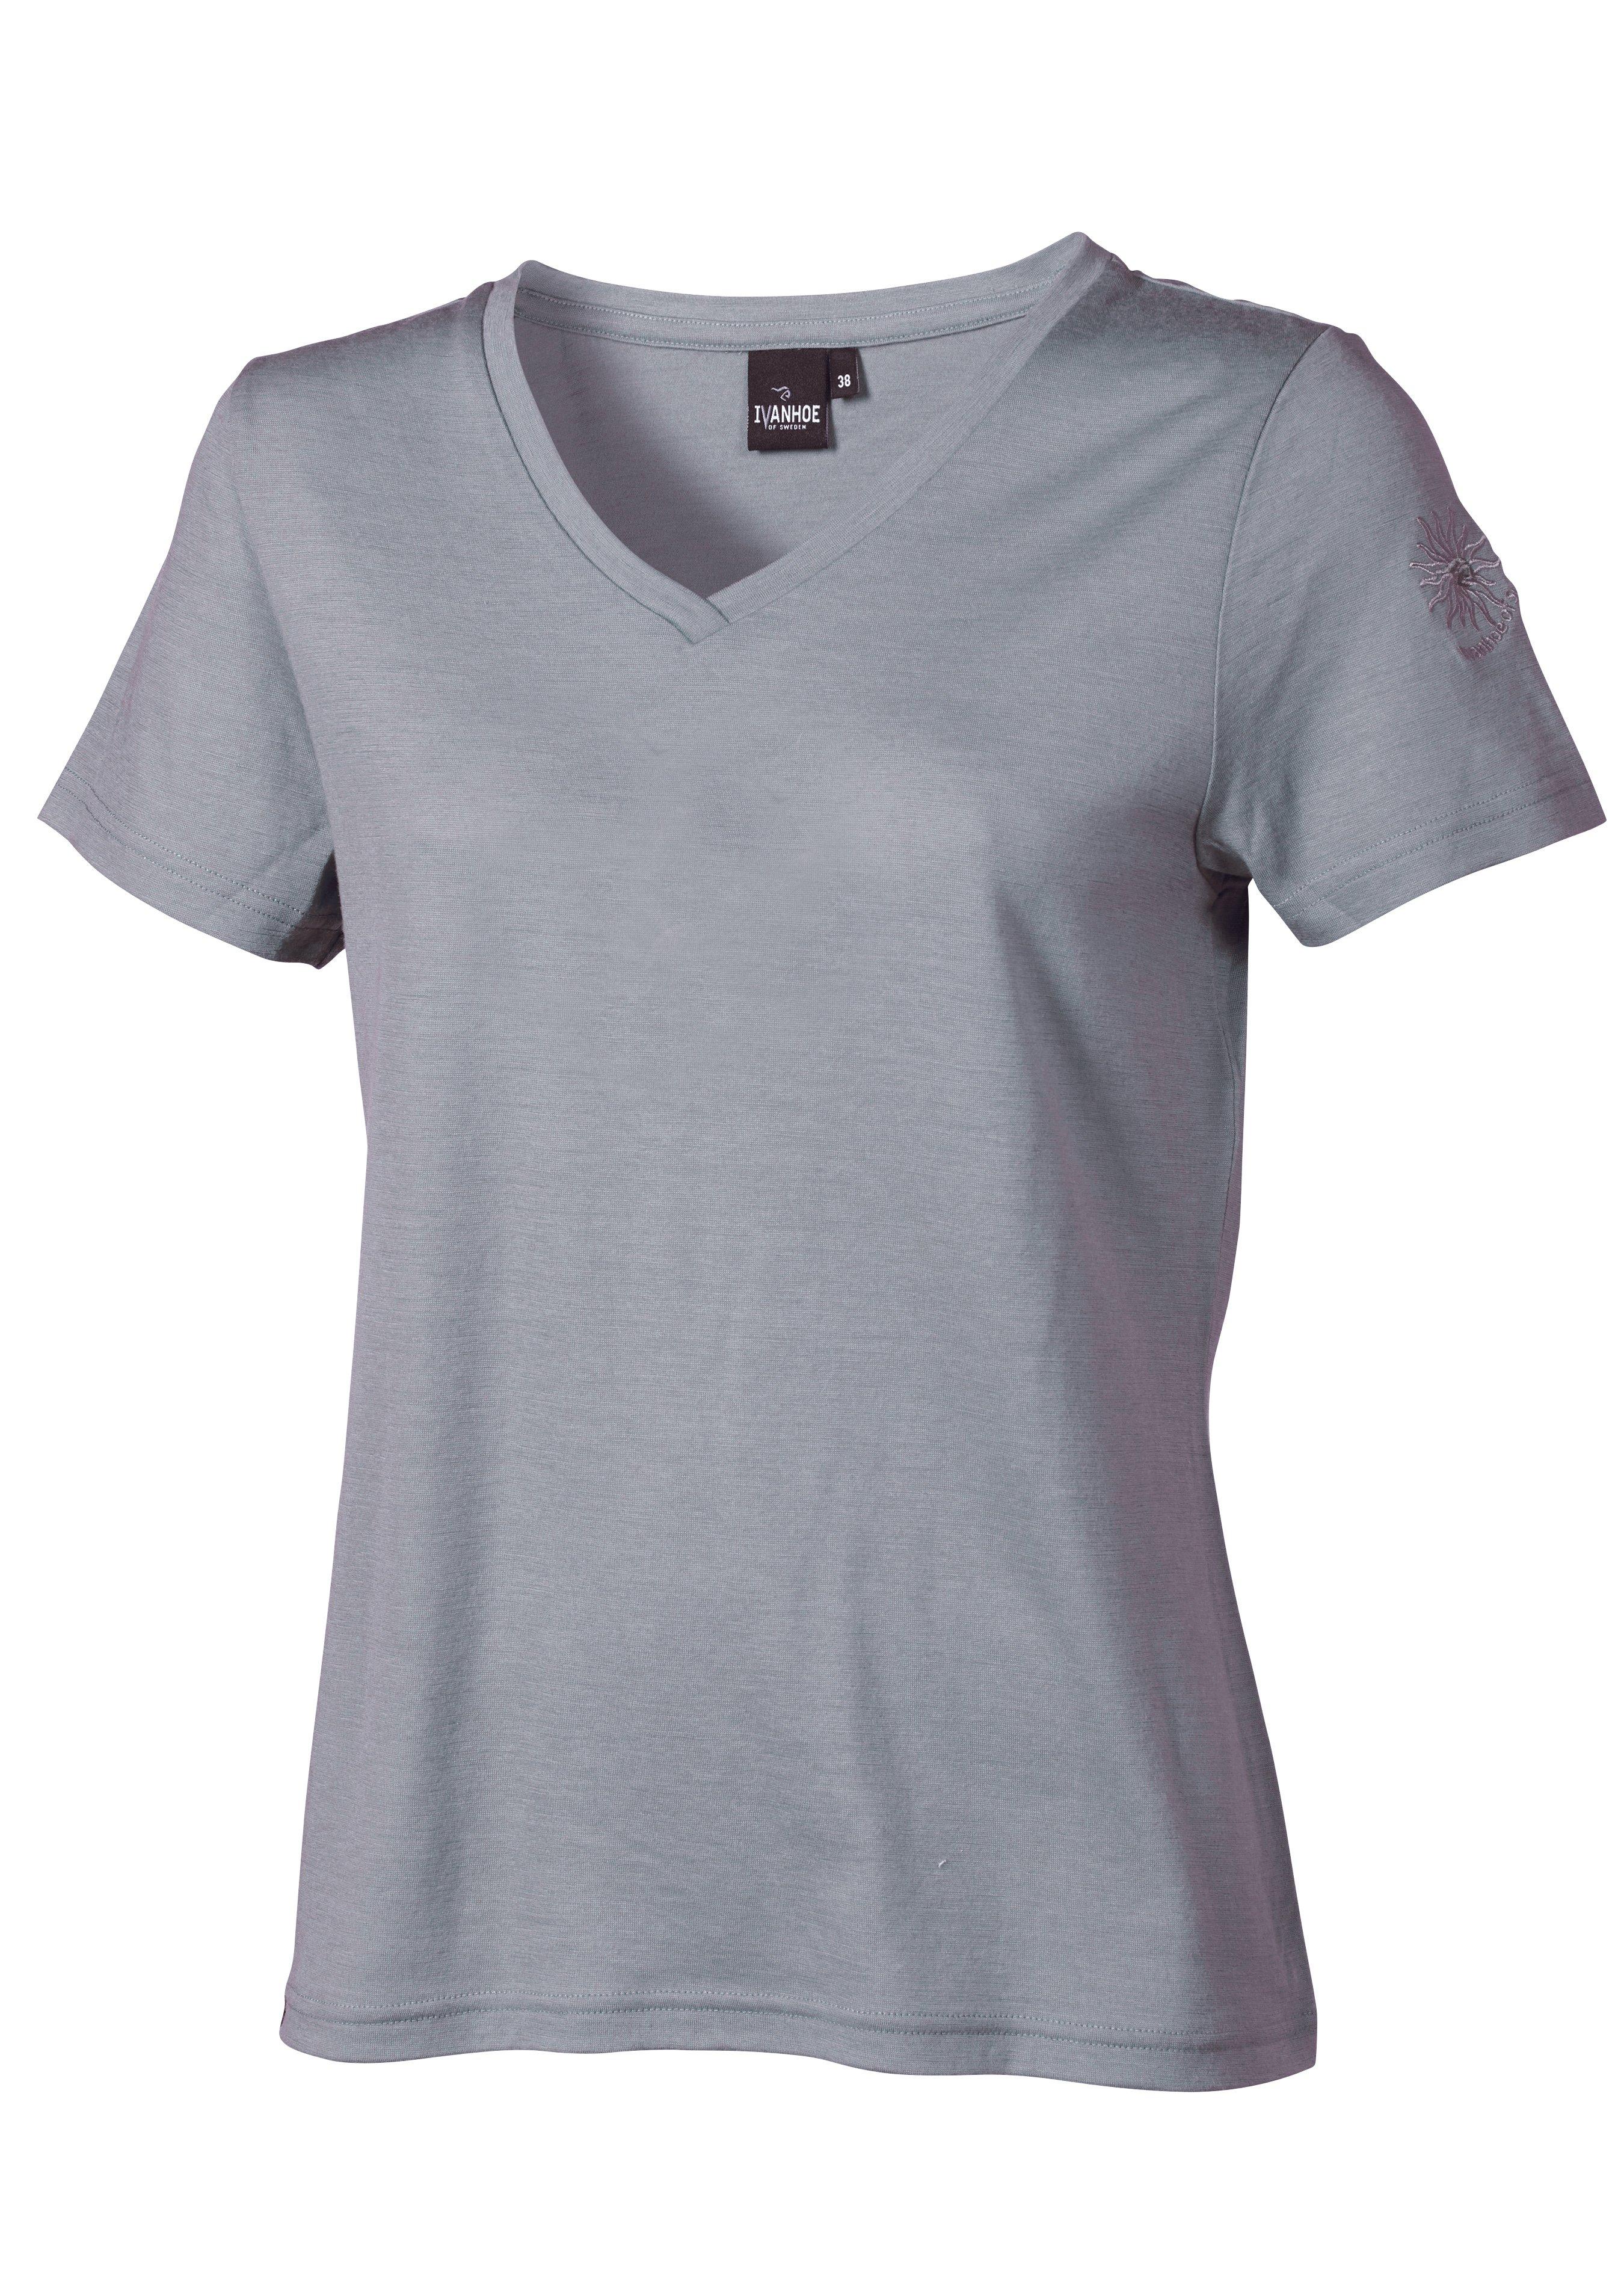 Shirt mérinos pour dames 25385736 2